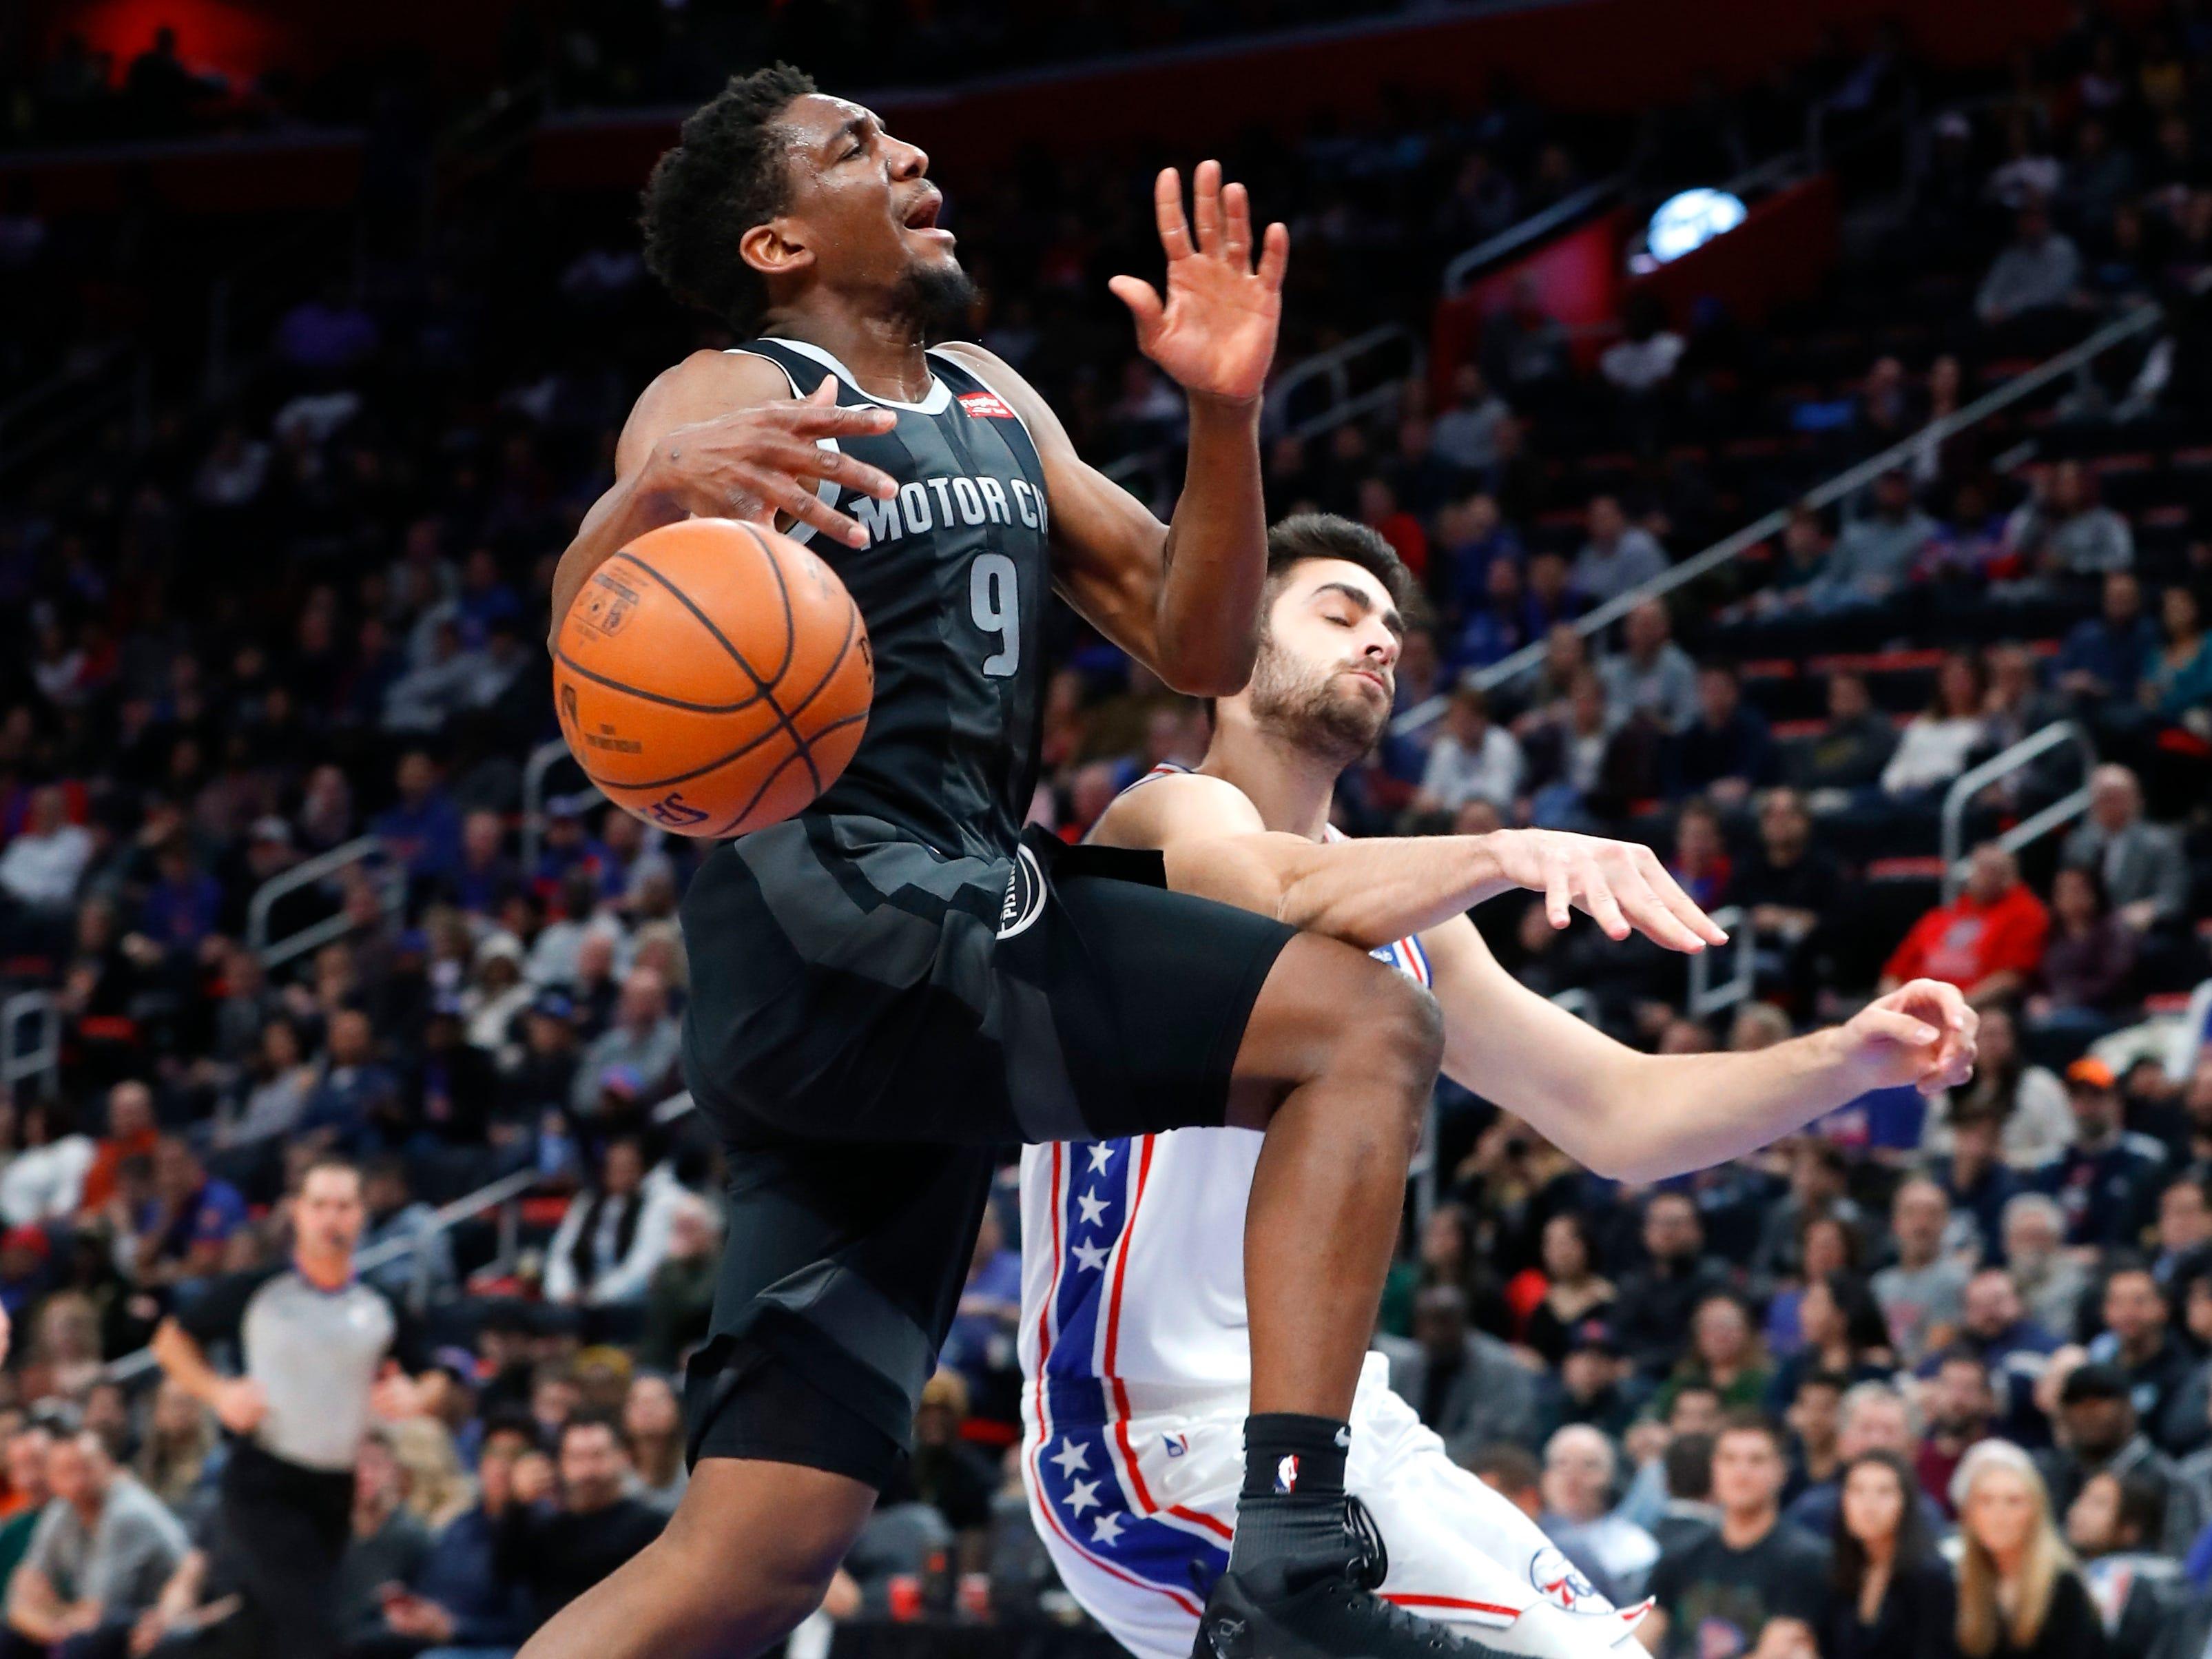 Philadelphia 76ers guard Furkan Korkmaz fouls Detroit Pistons guard Langston Galloway (9) in the first half.